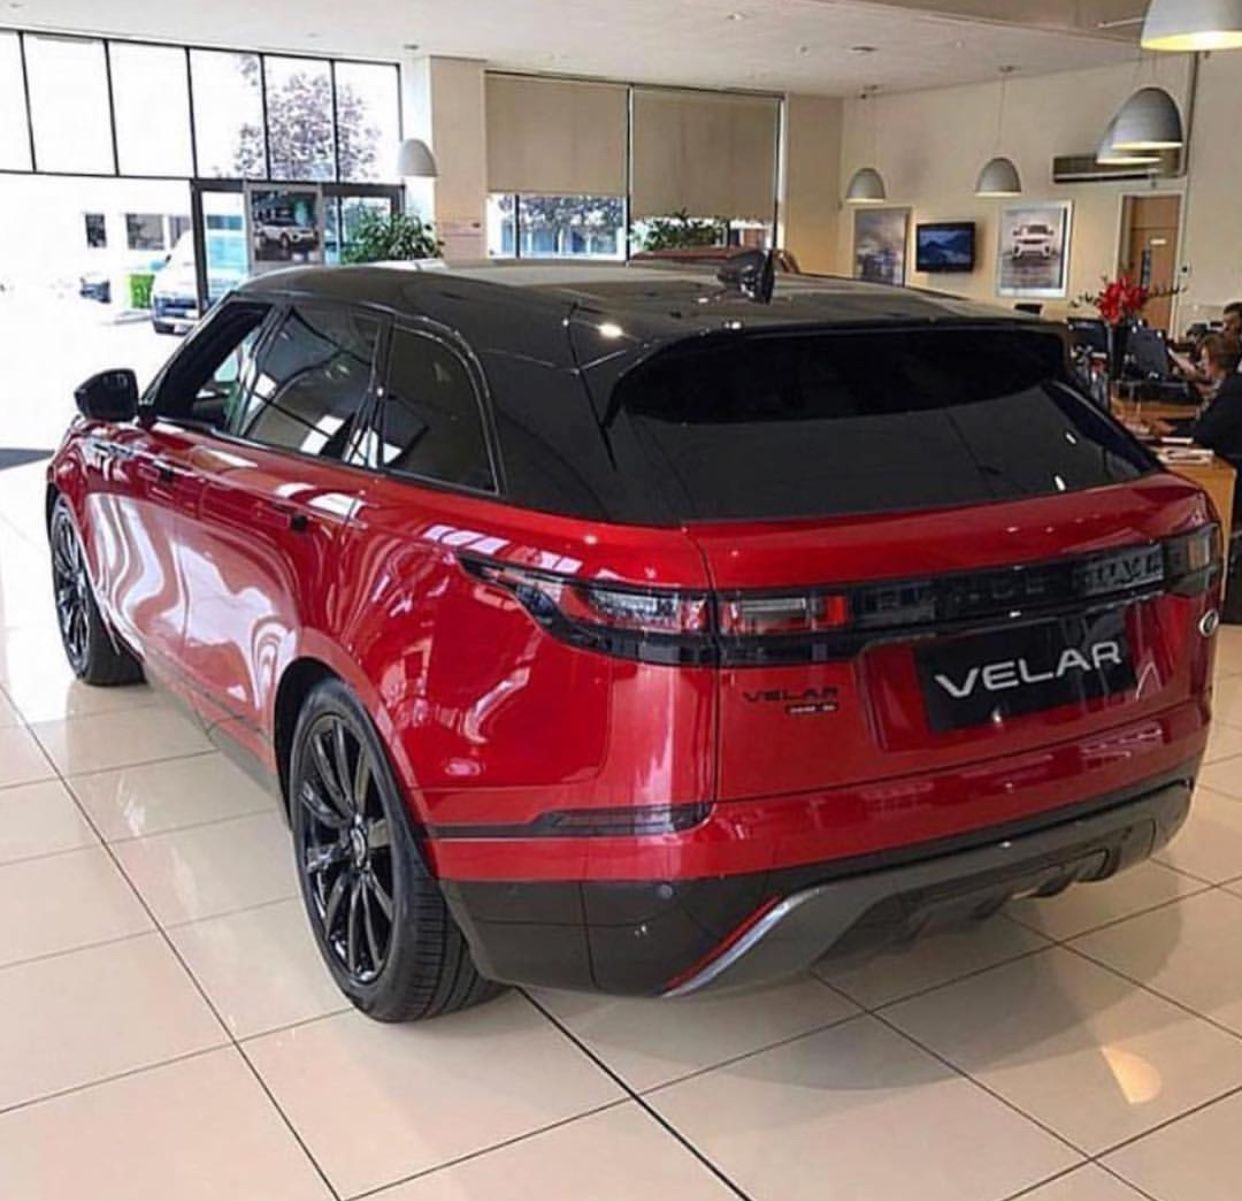 RangeRover Velar SportsUtilityVehicles Lux cars, Land